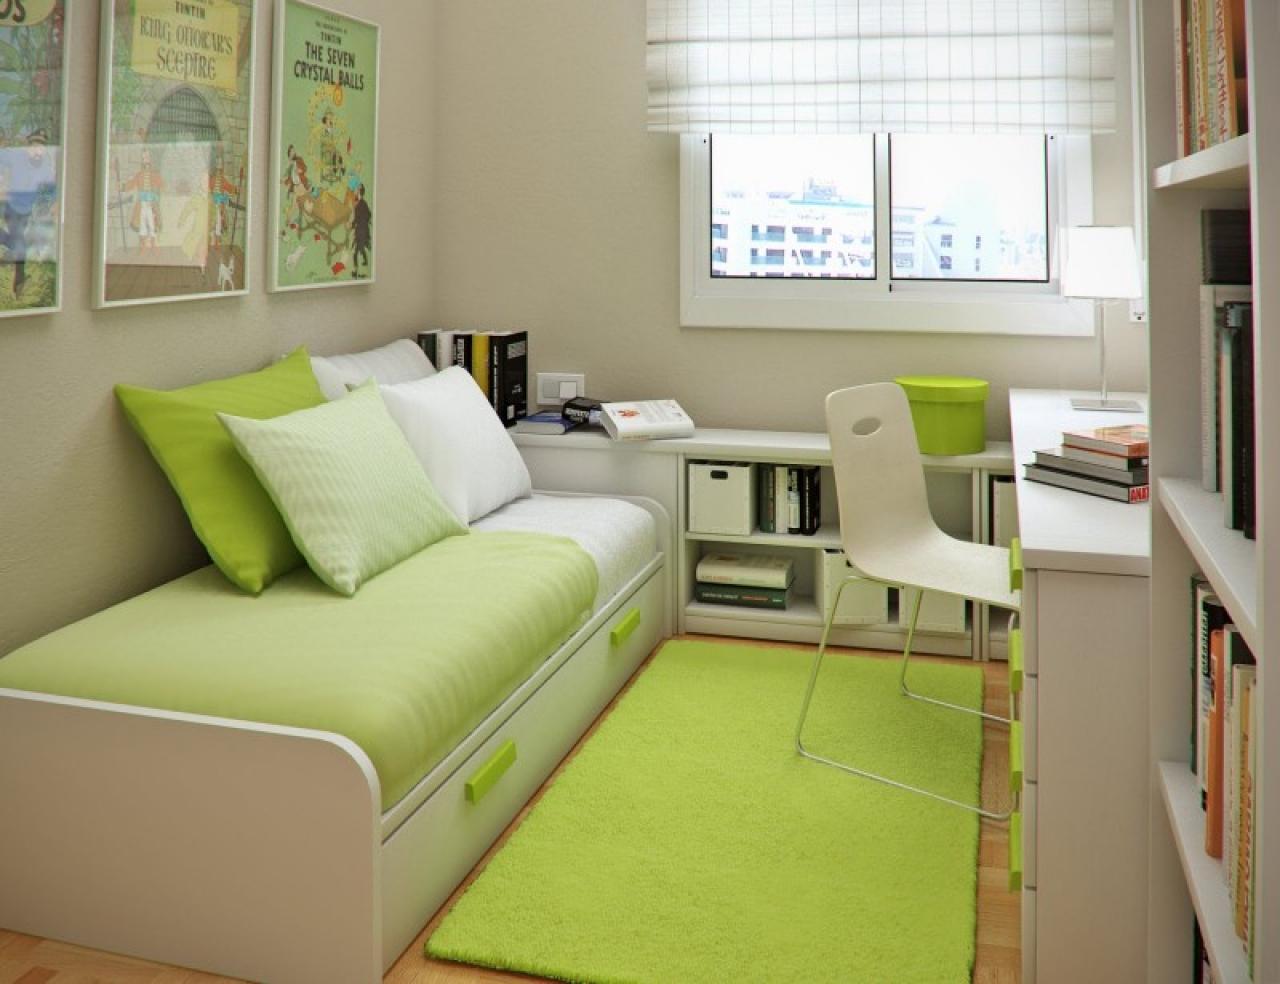 Fabulous-Green-Small-Bedroom-Ideas-Inspiration